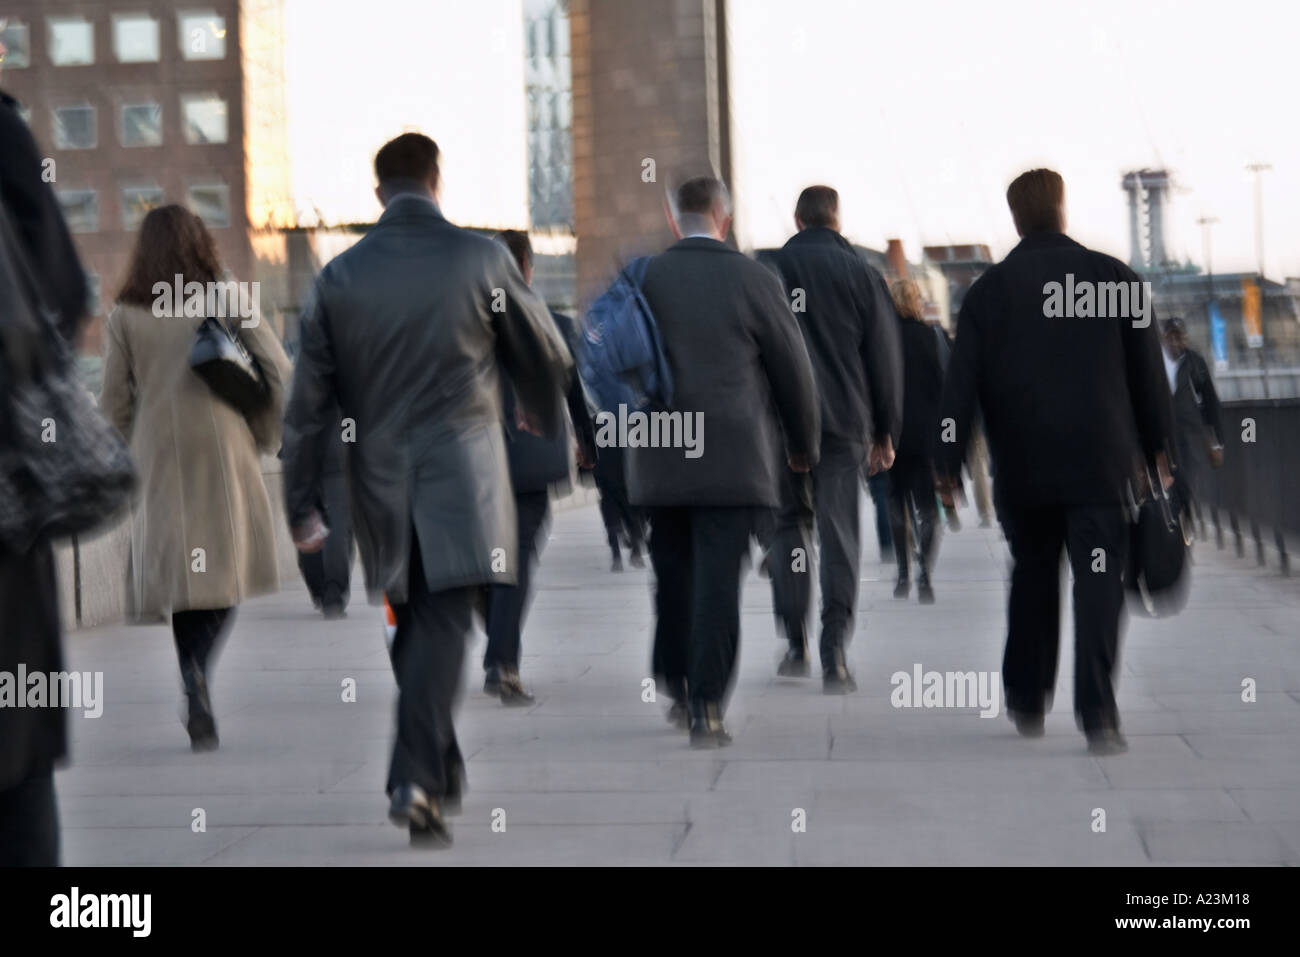 crowds of people commuters on London Bridge walking to work - Stock Image